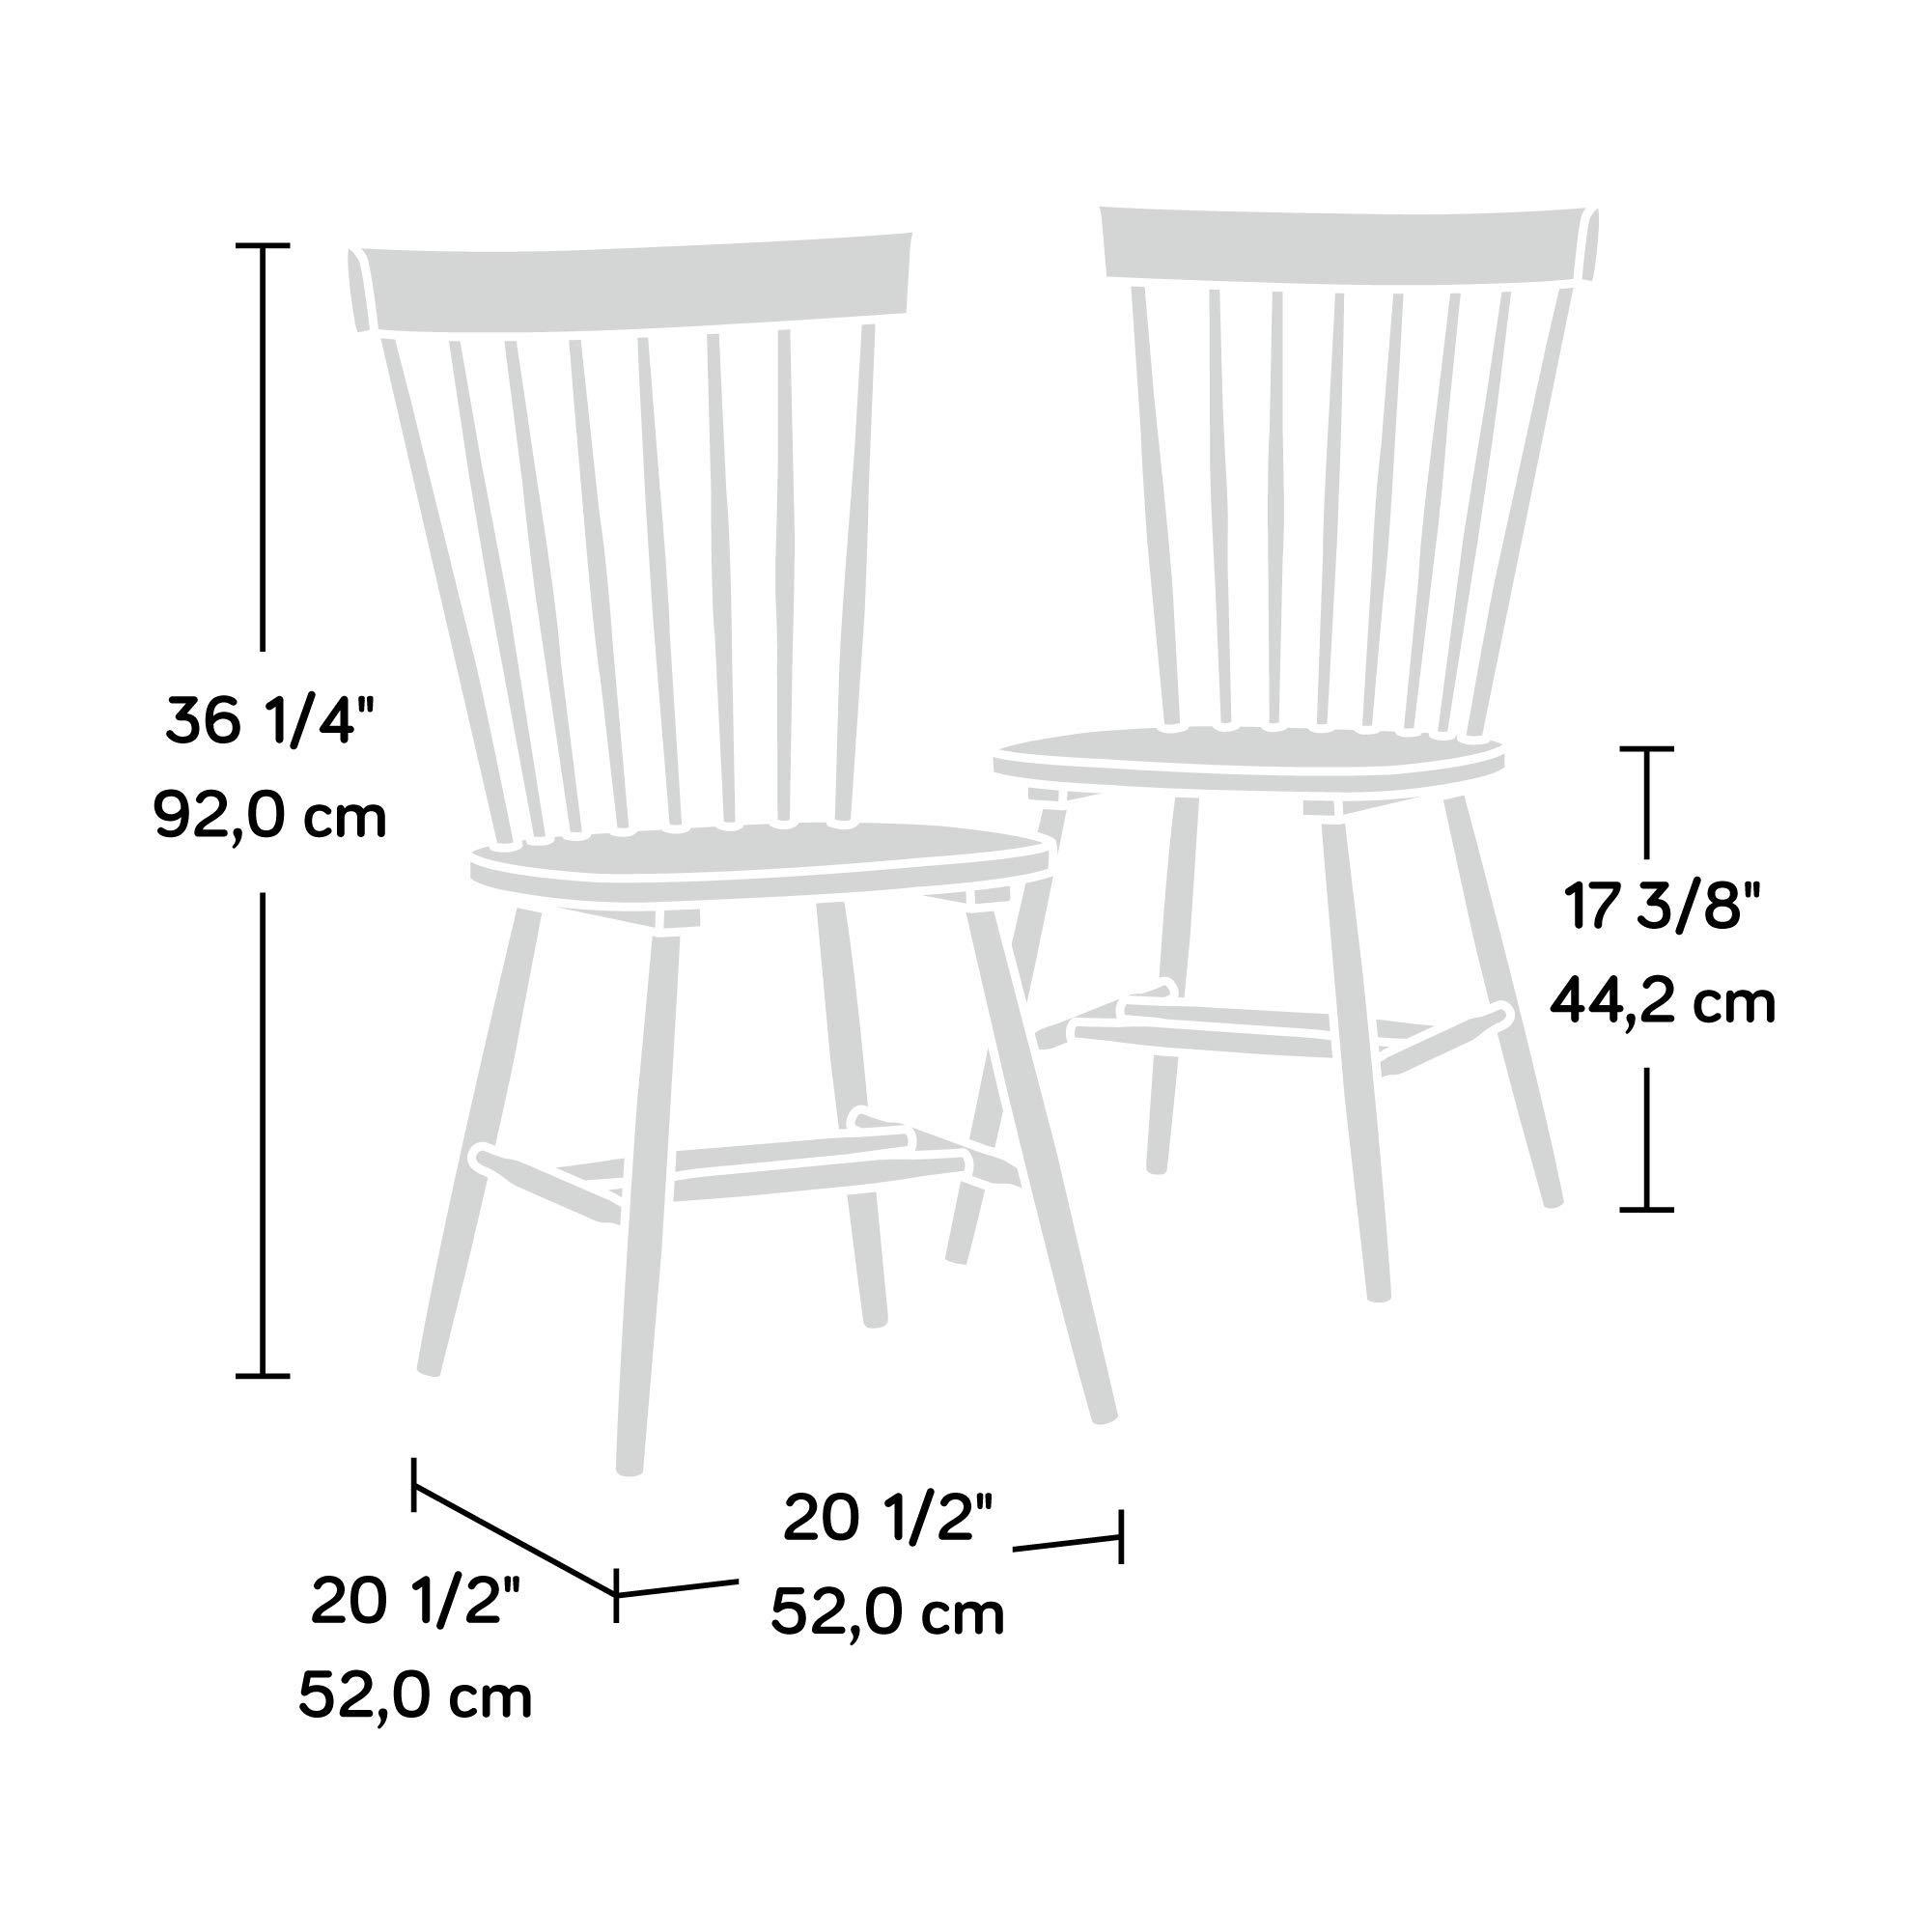 Sauder 418892 New Grange Spindle Back Chairs, L: 20.47'' x W: 21.26'' x H: 36.22'', Black finish by Sauder (Image #3)